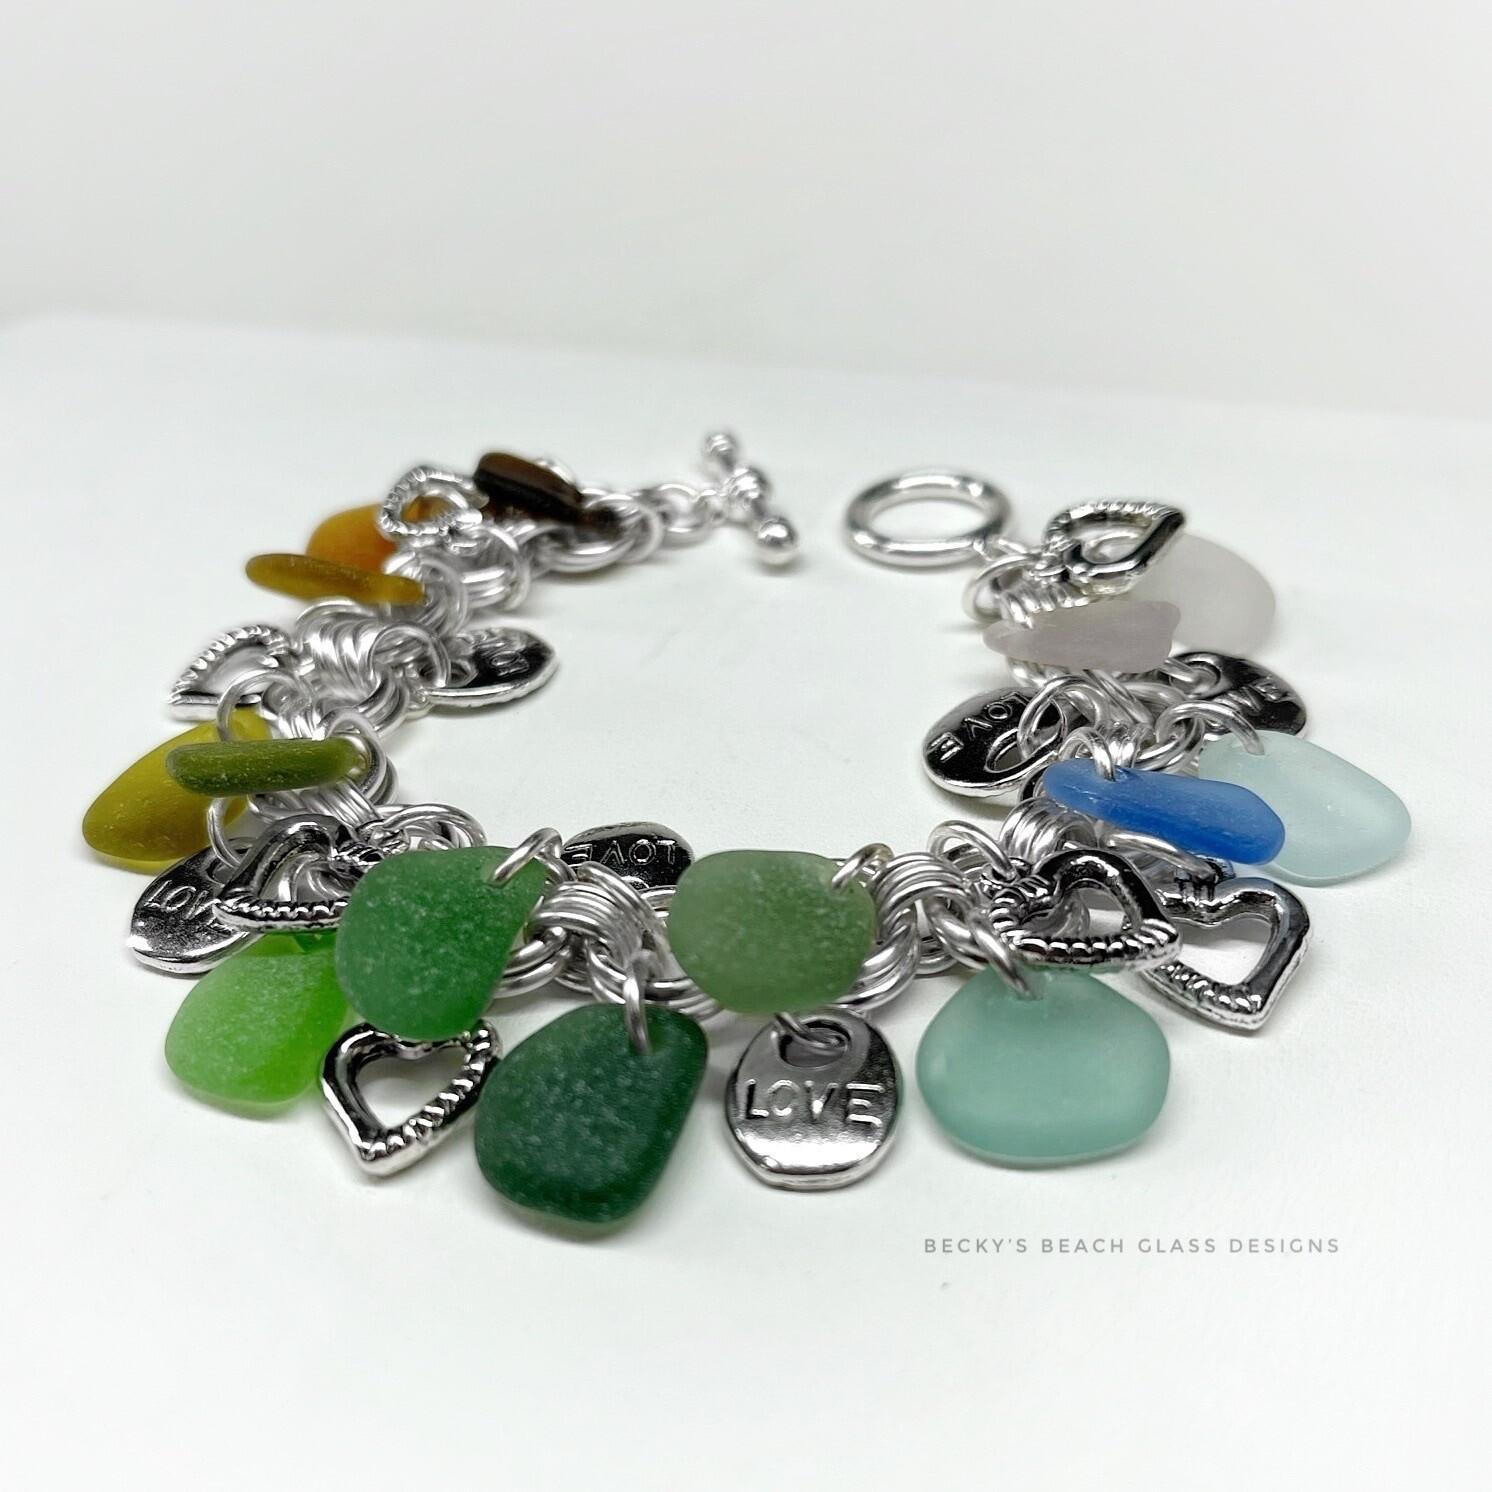 Seaglass & Sweet Hearts Cha Cha Bracelet